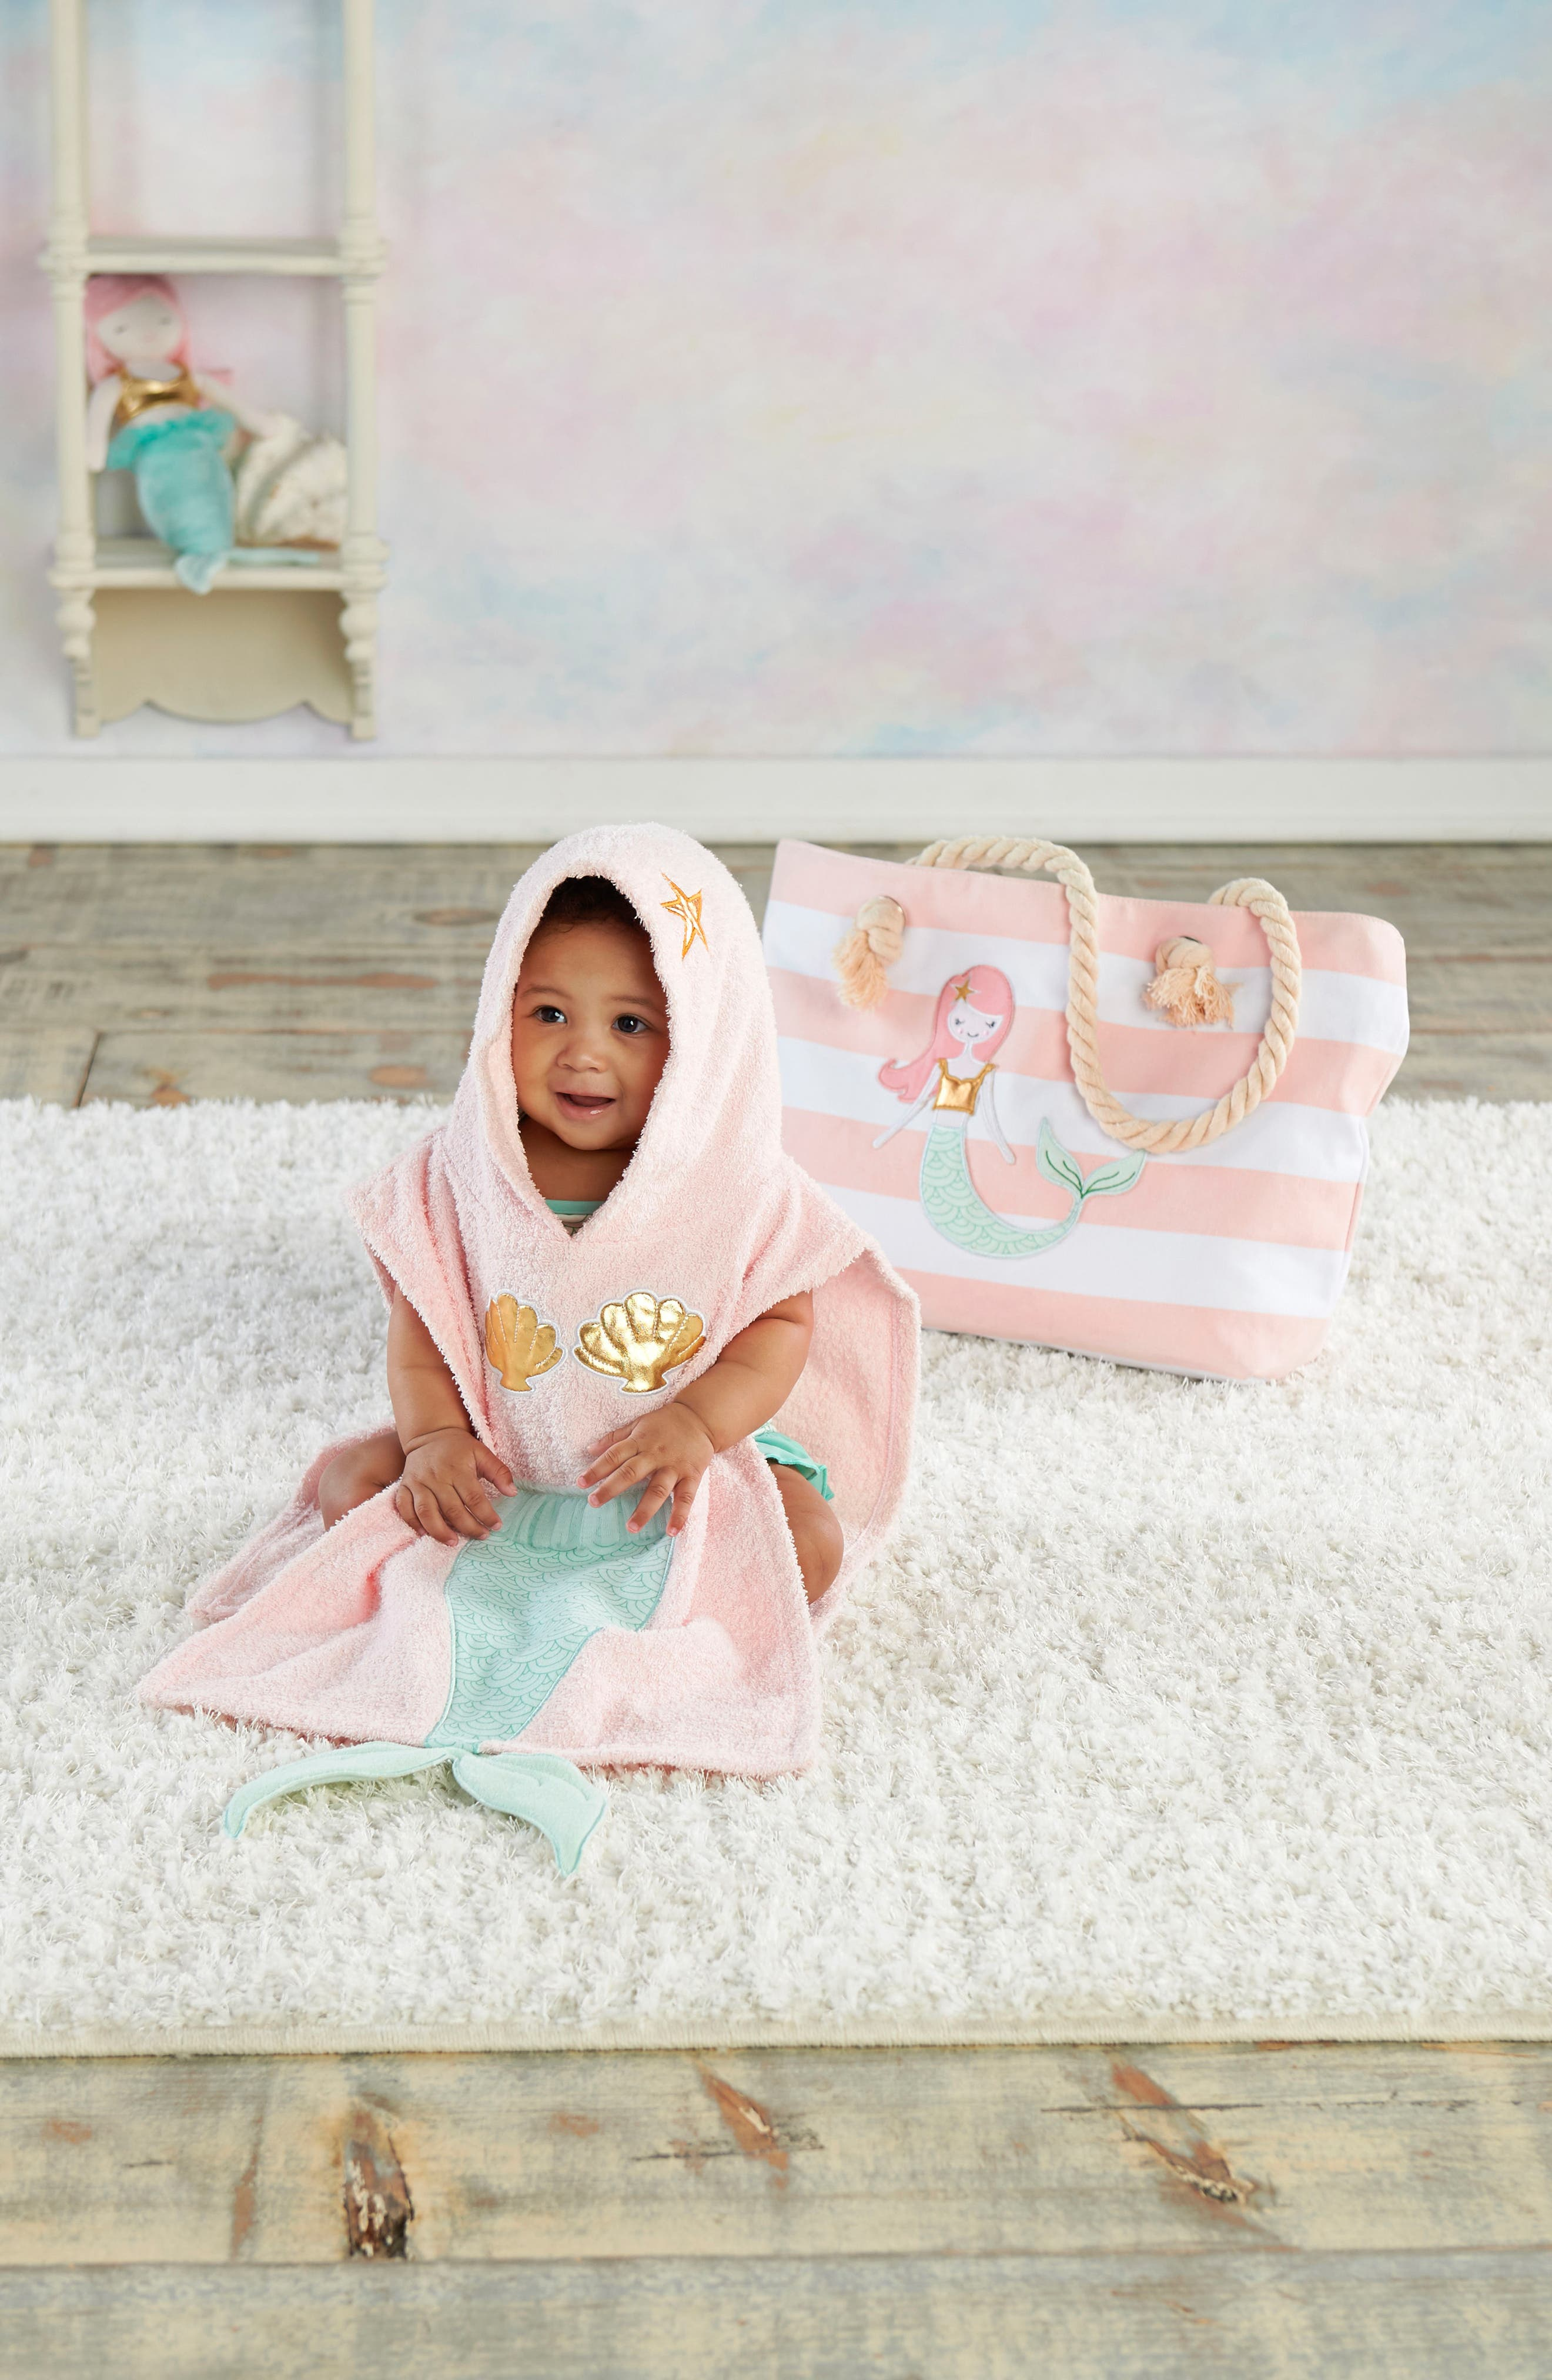 Mermaid Hooded Towel, Swimsuit, Sun Hat & Tote Set,                             Alternate thumbnail 3, color,                             PINK